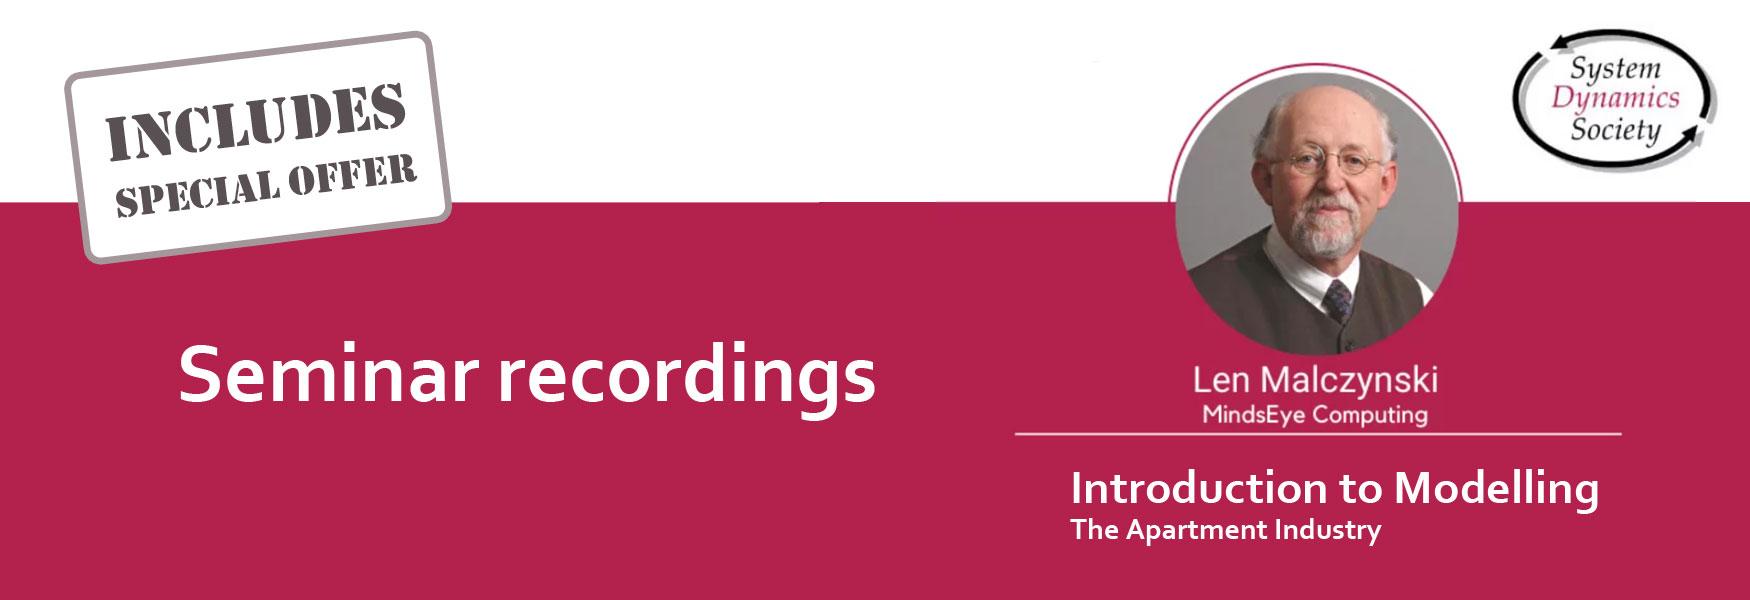 Seminar Recordings